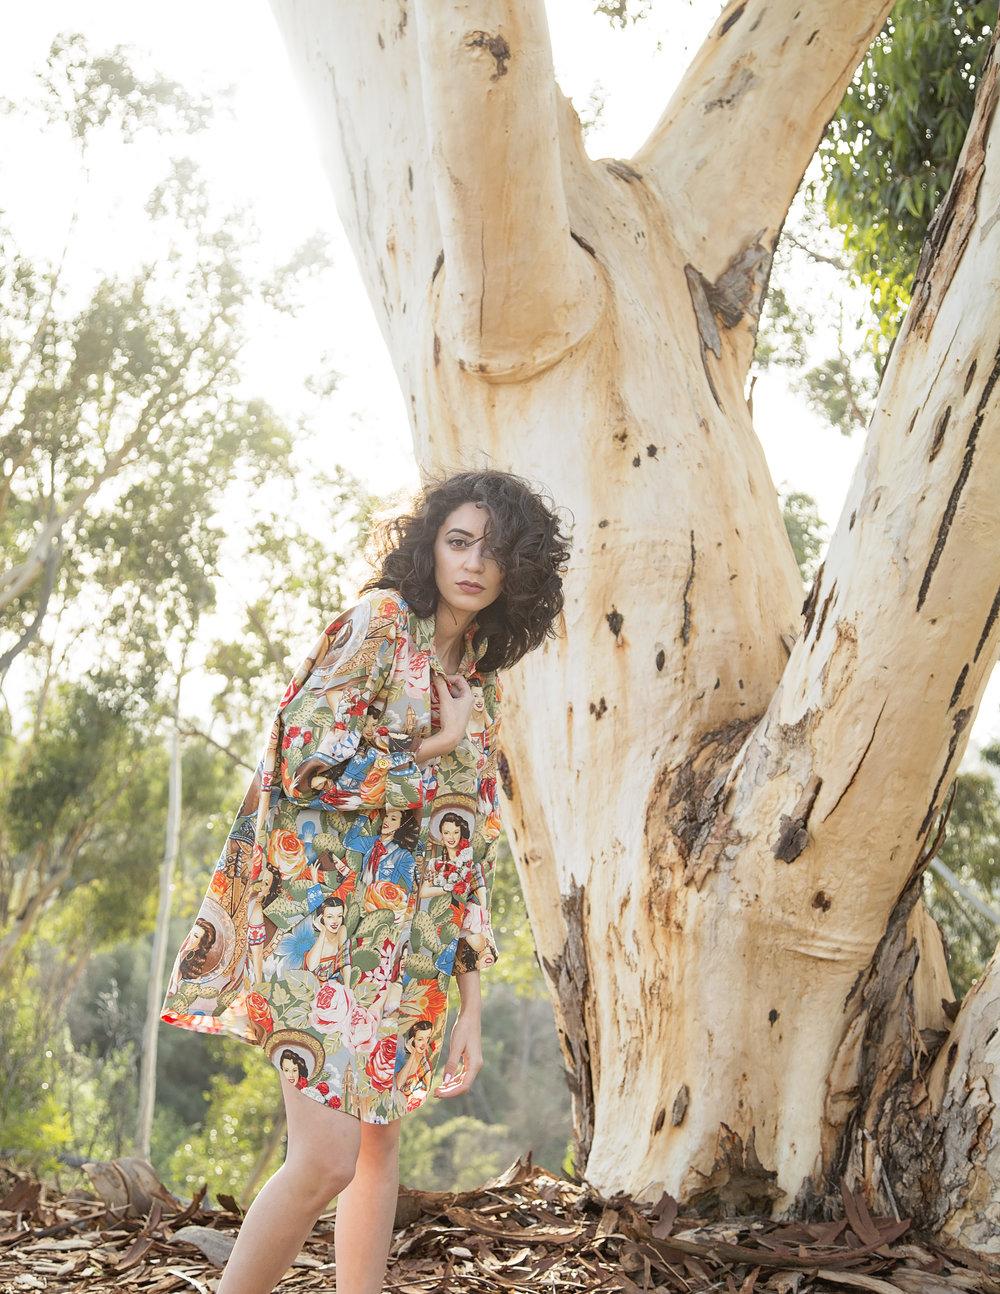 April_Staso_los angeles_fashion_photographer_lookbook_photography_LA lookbook_photographer.jpg